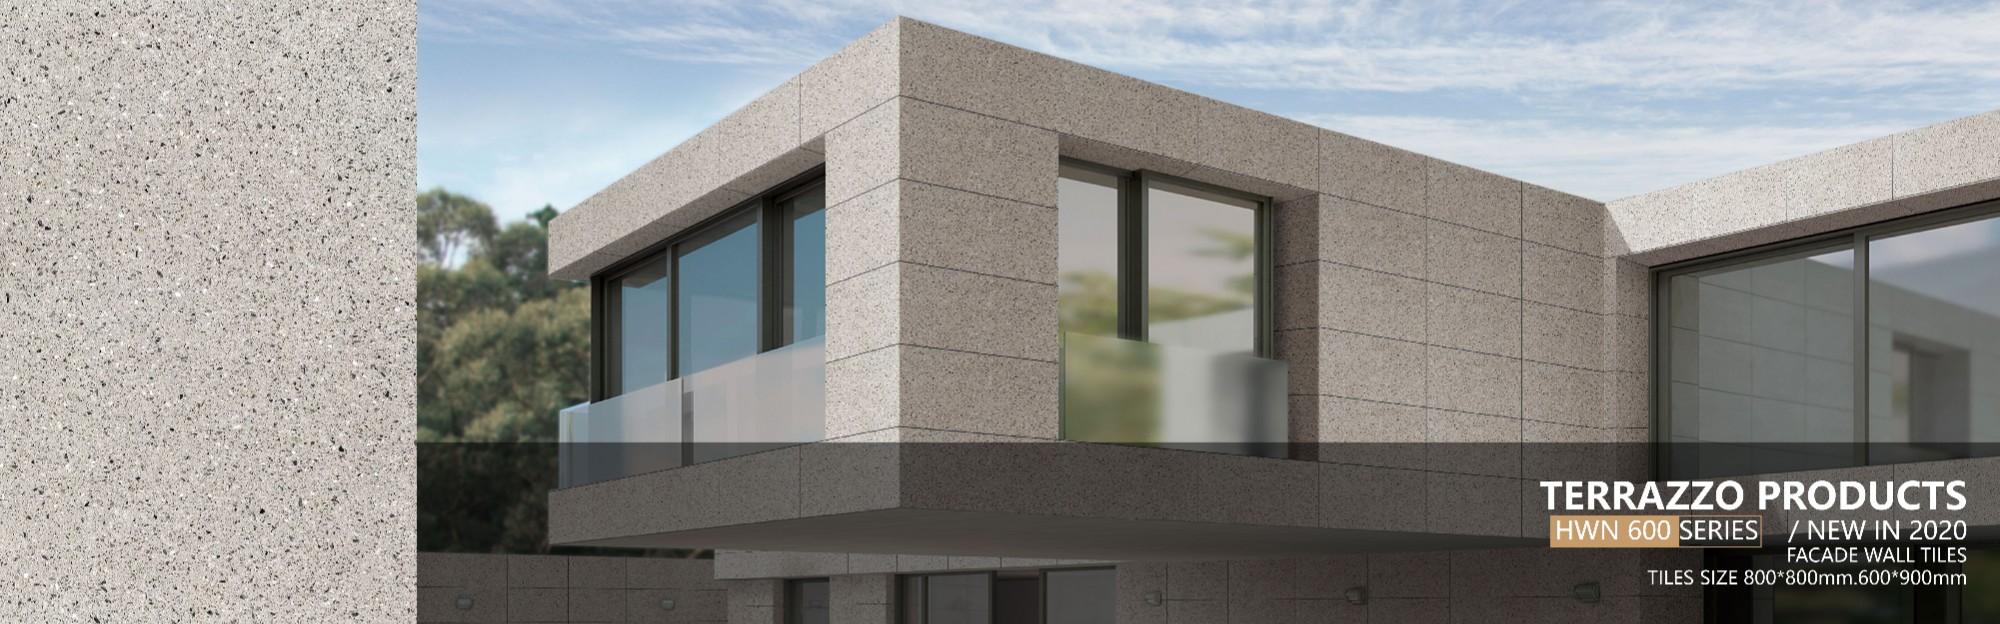 Marble aggregate outdoor terrazzo cladding